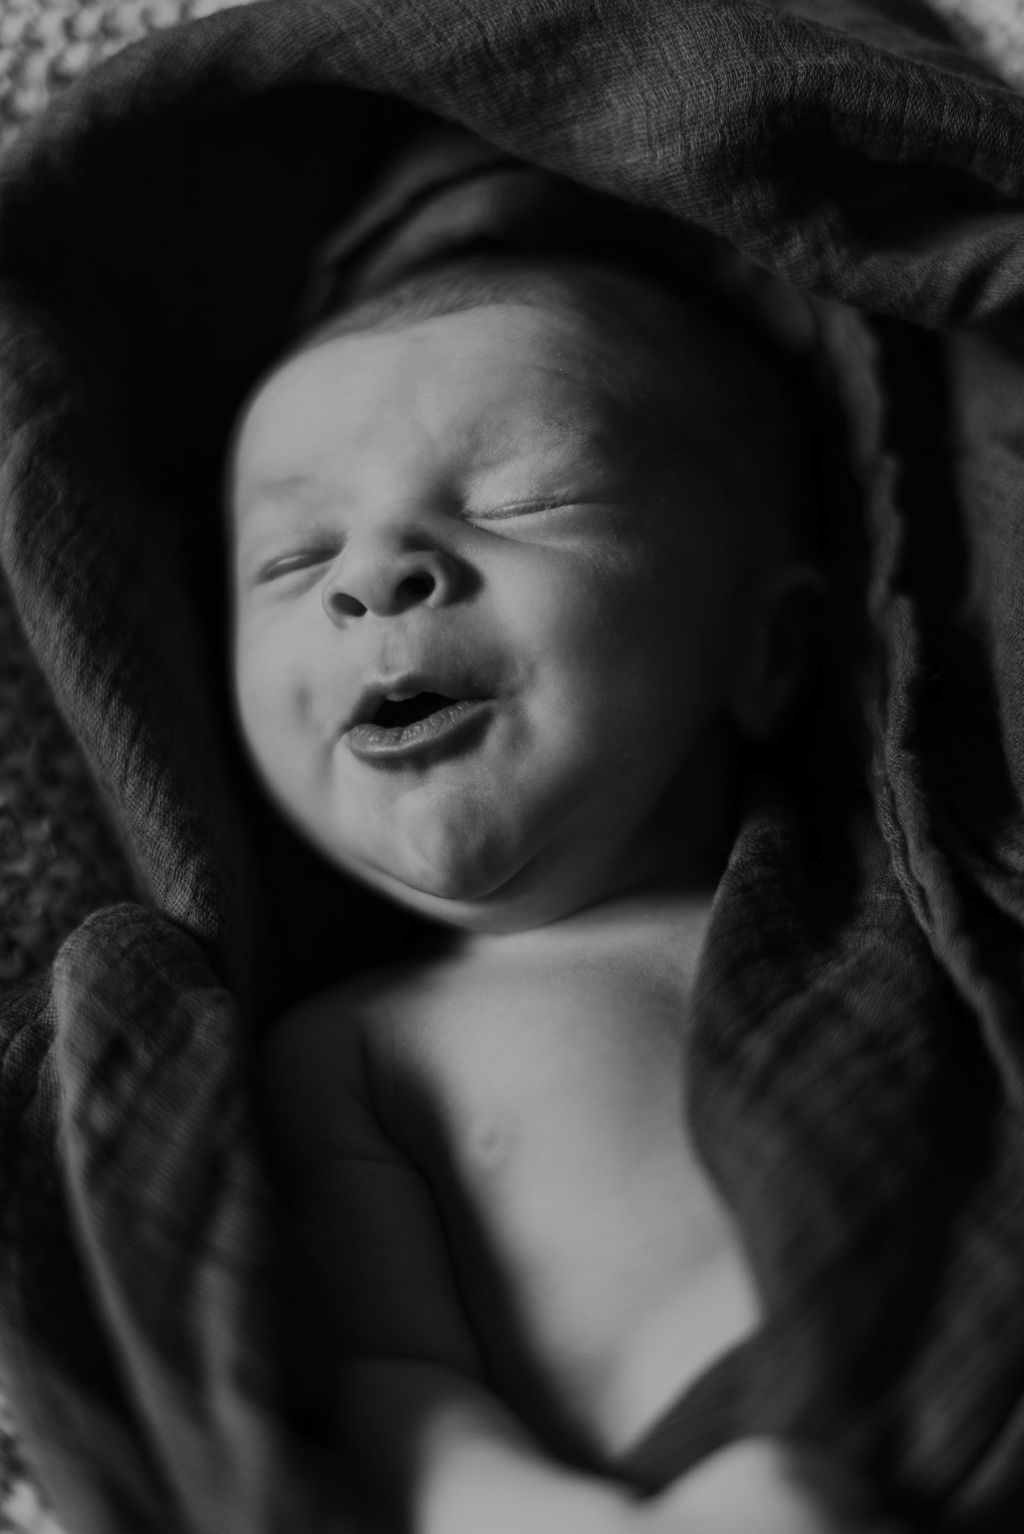 in-home-newborn-session-jonah-dakota-chasity-photography-13.jpg